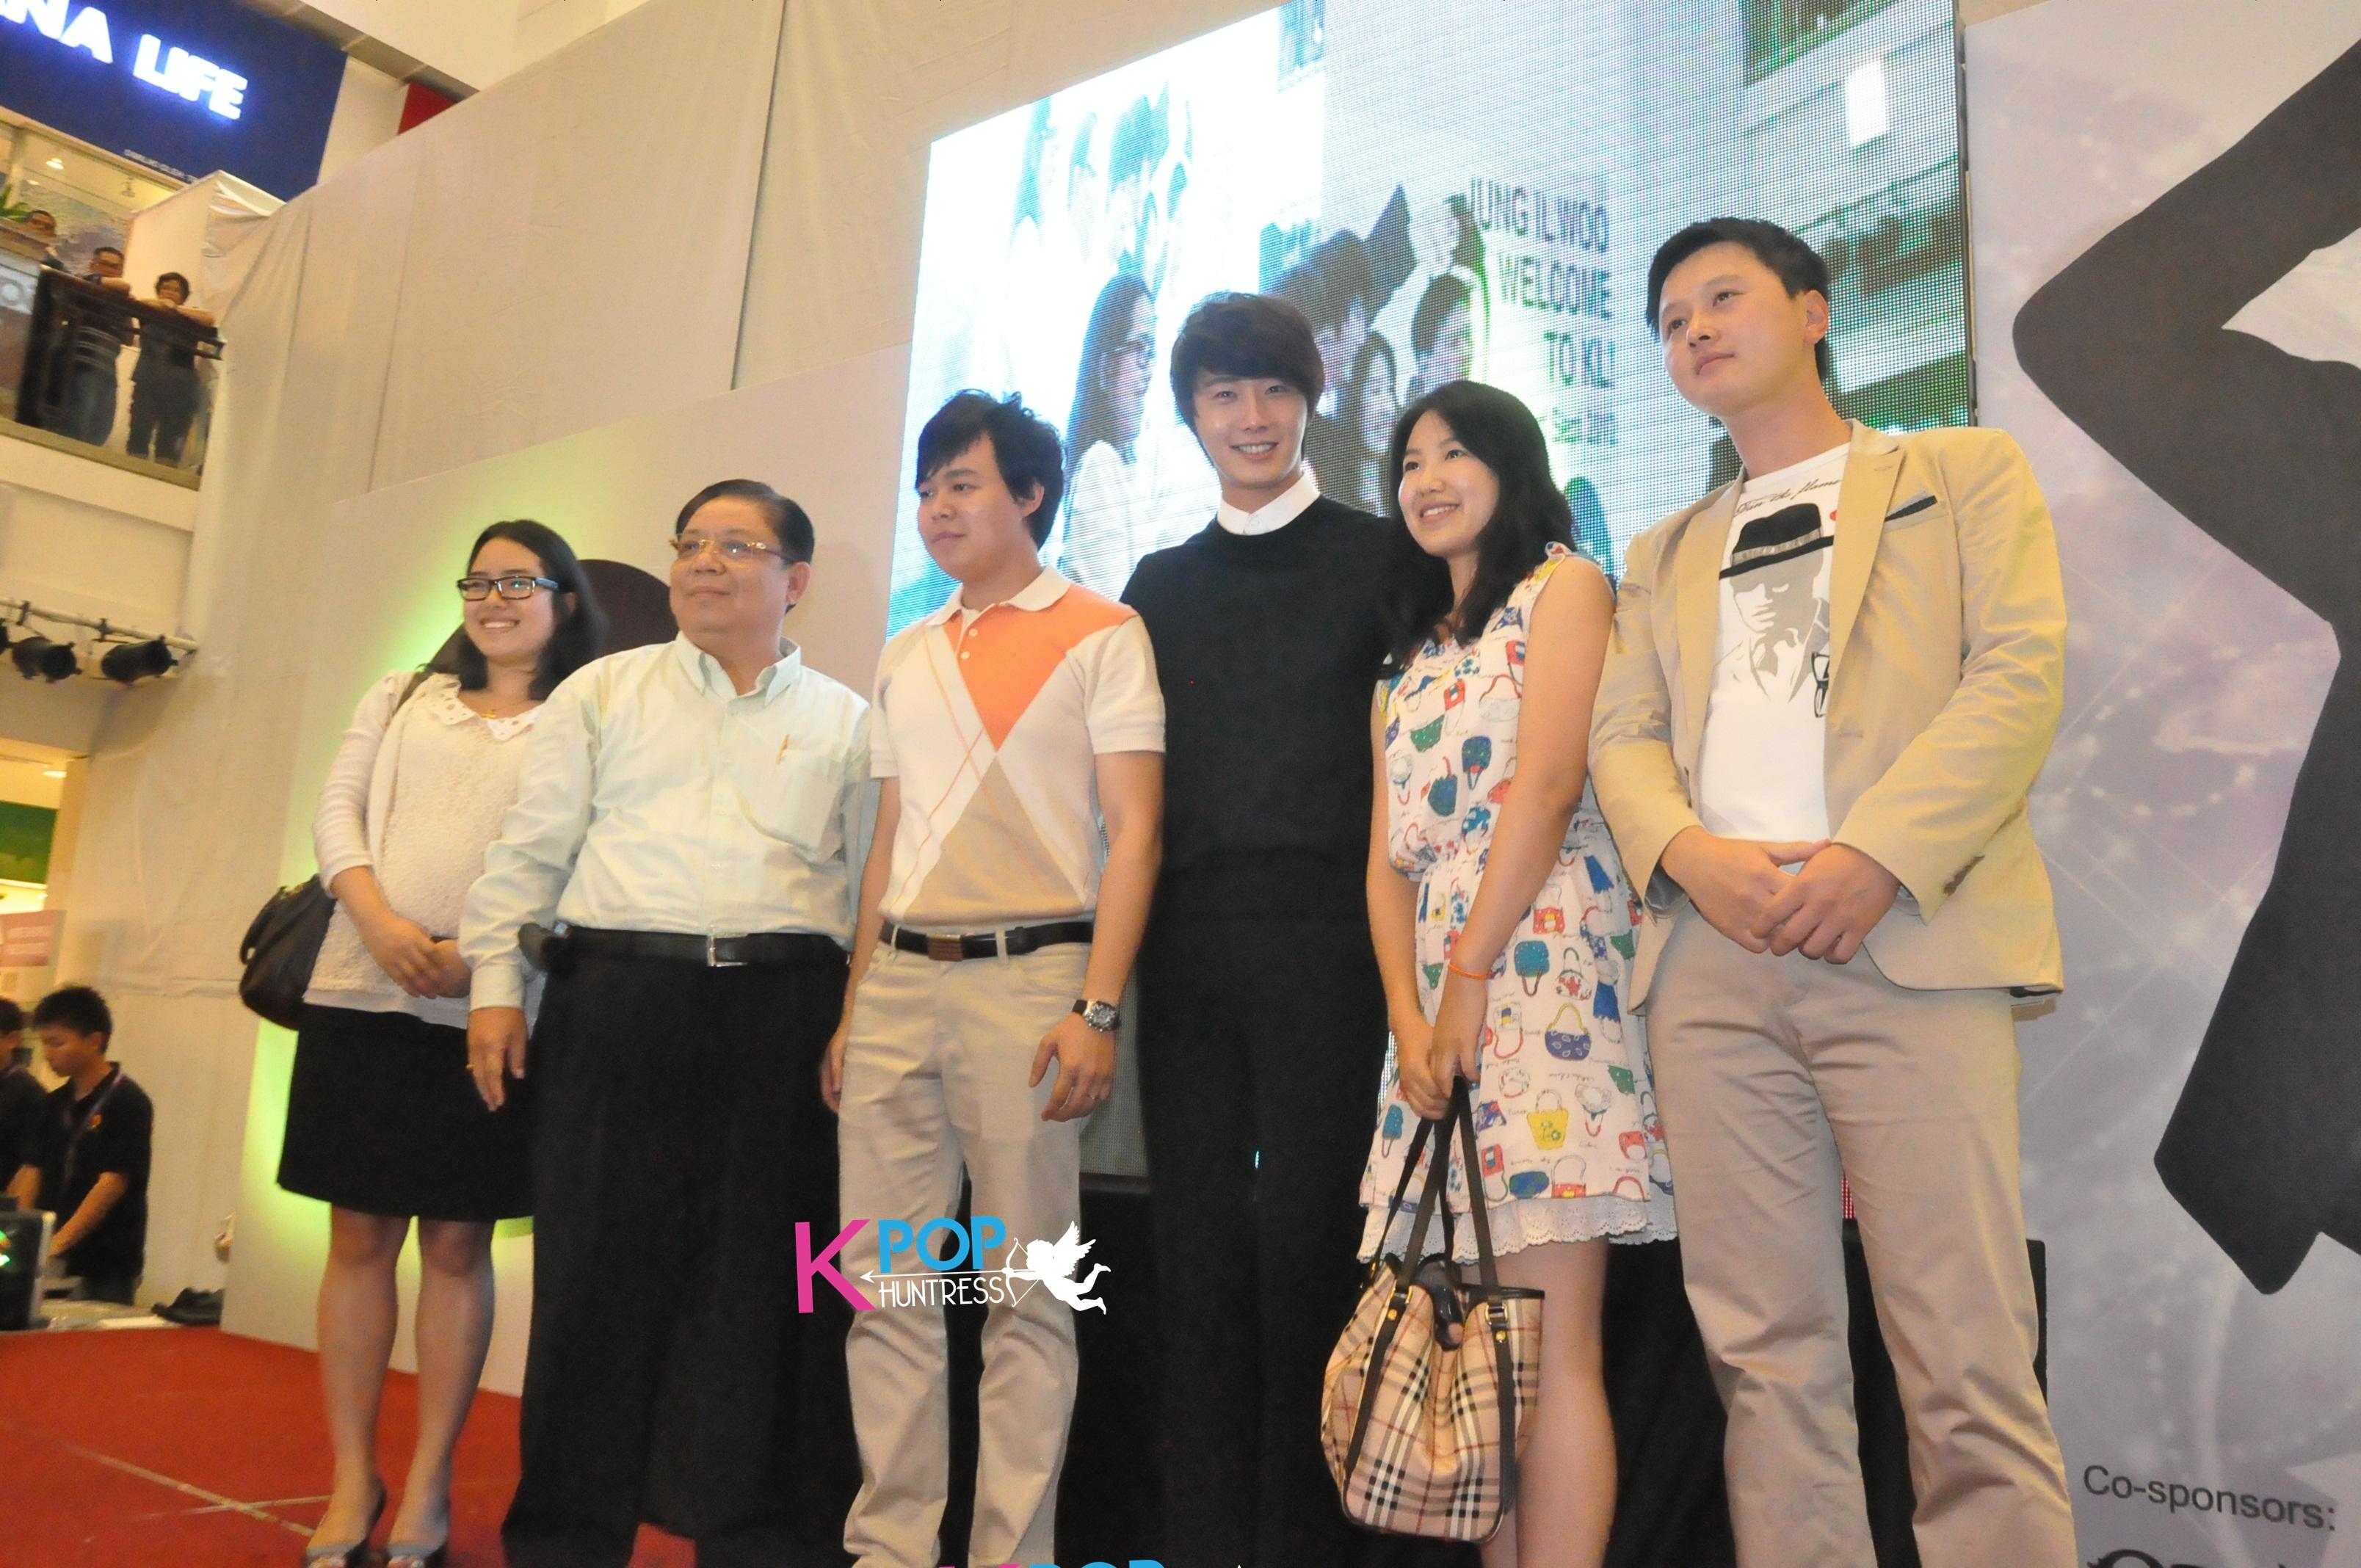 Foto jeong il woo dating